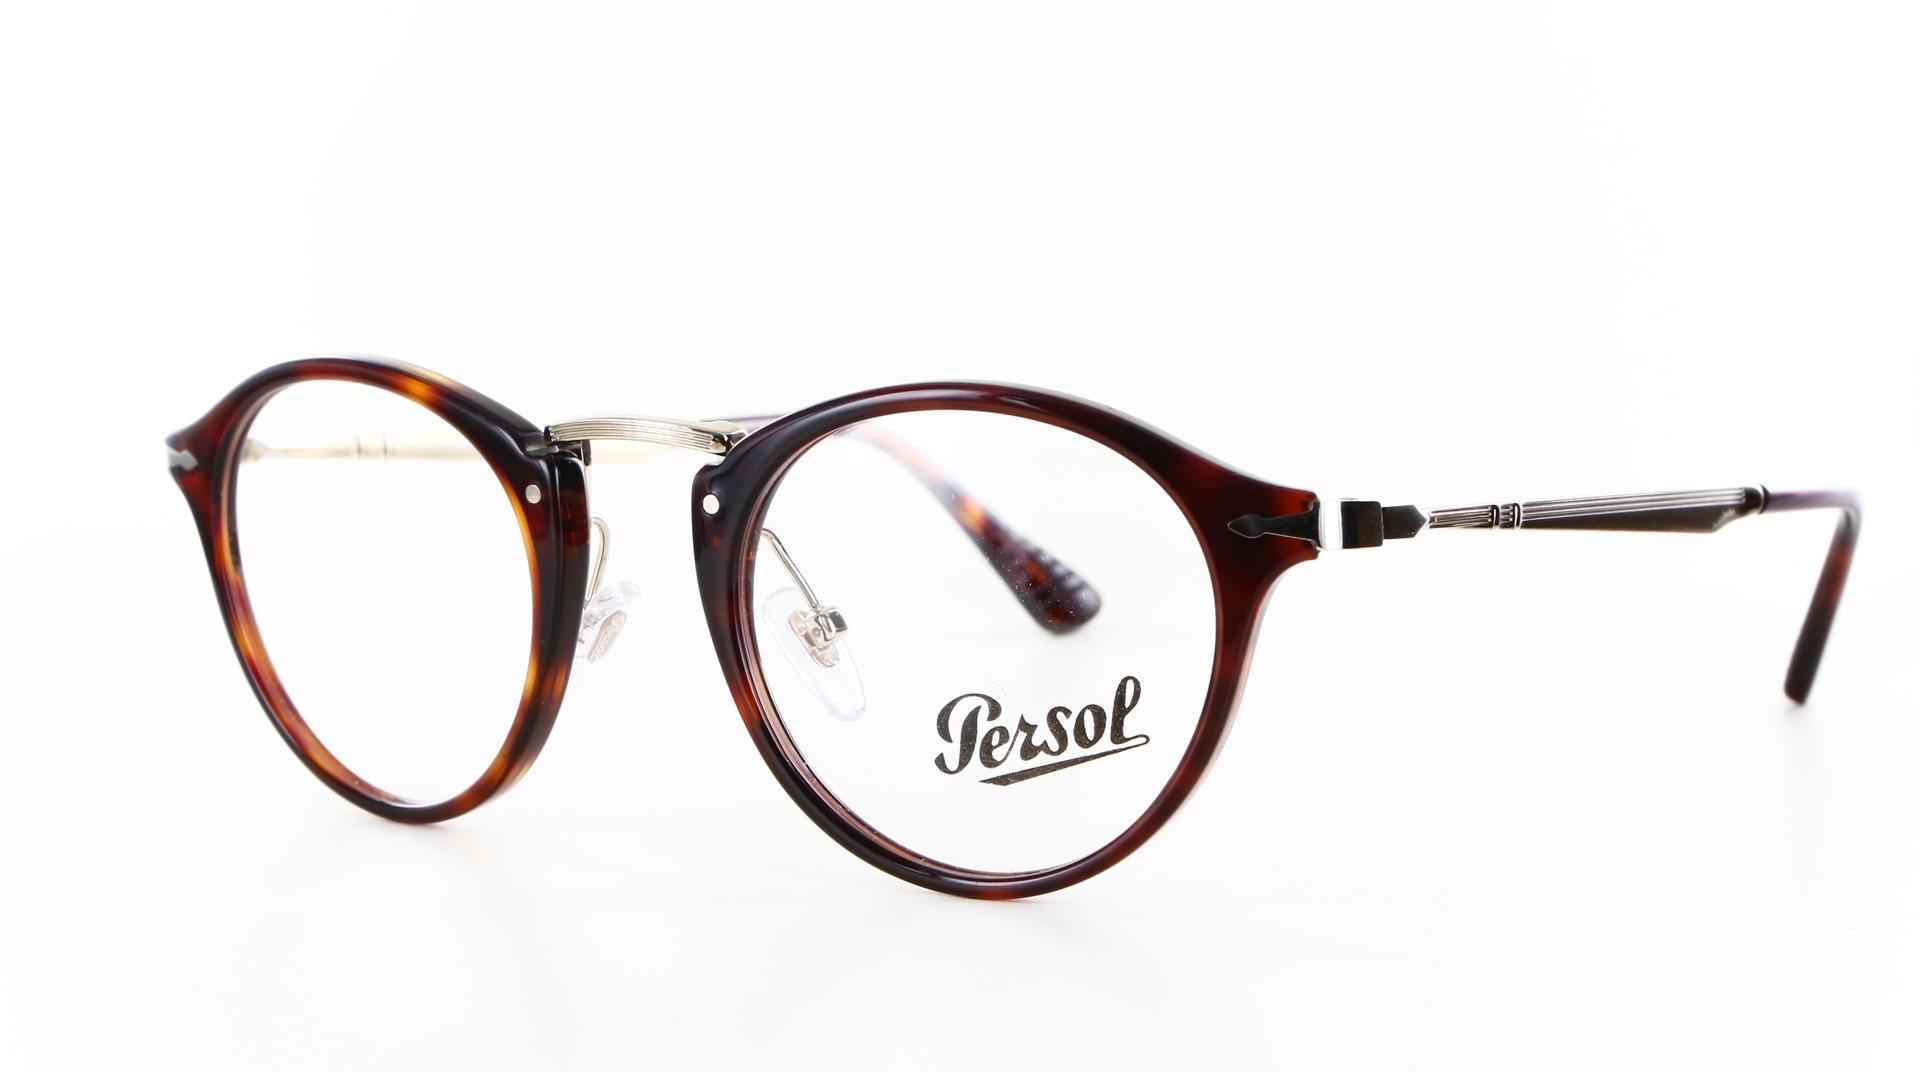 Persol - ref: 77874